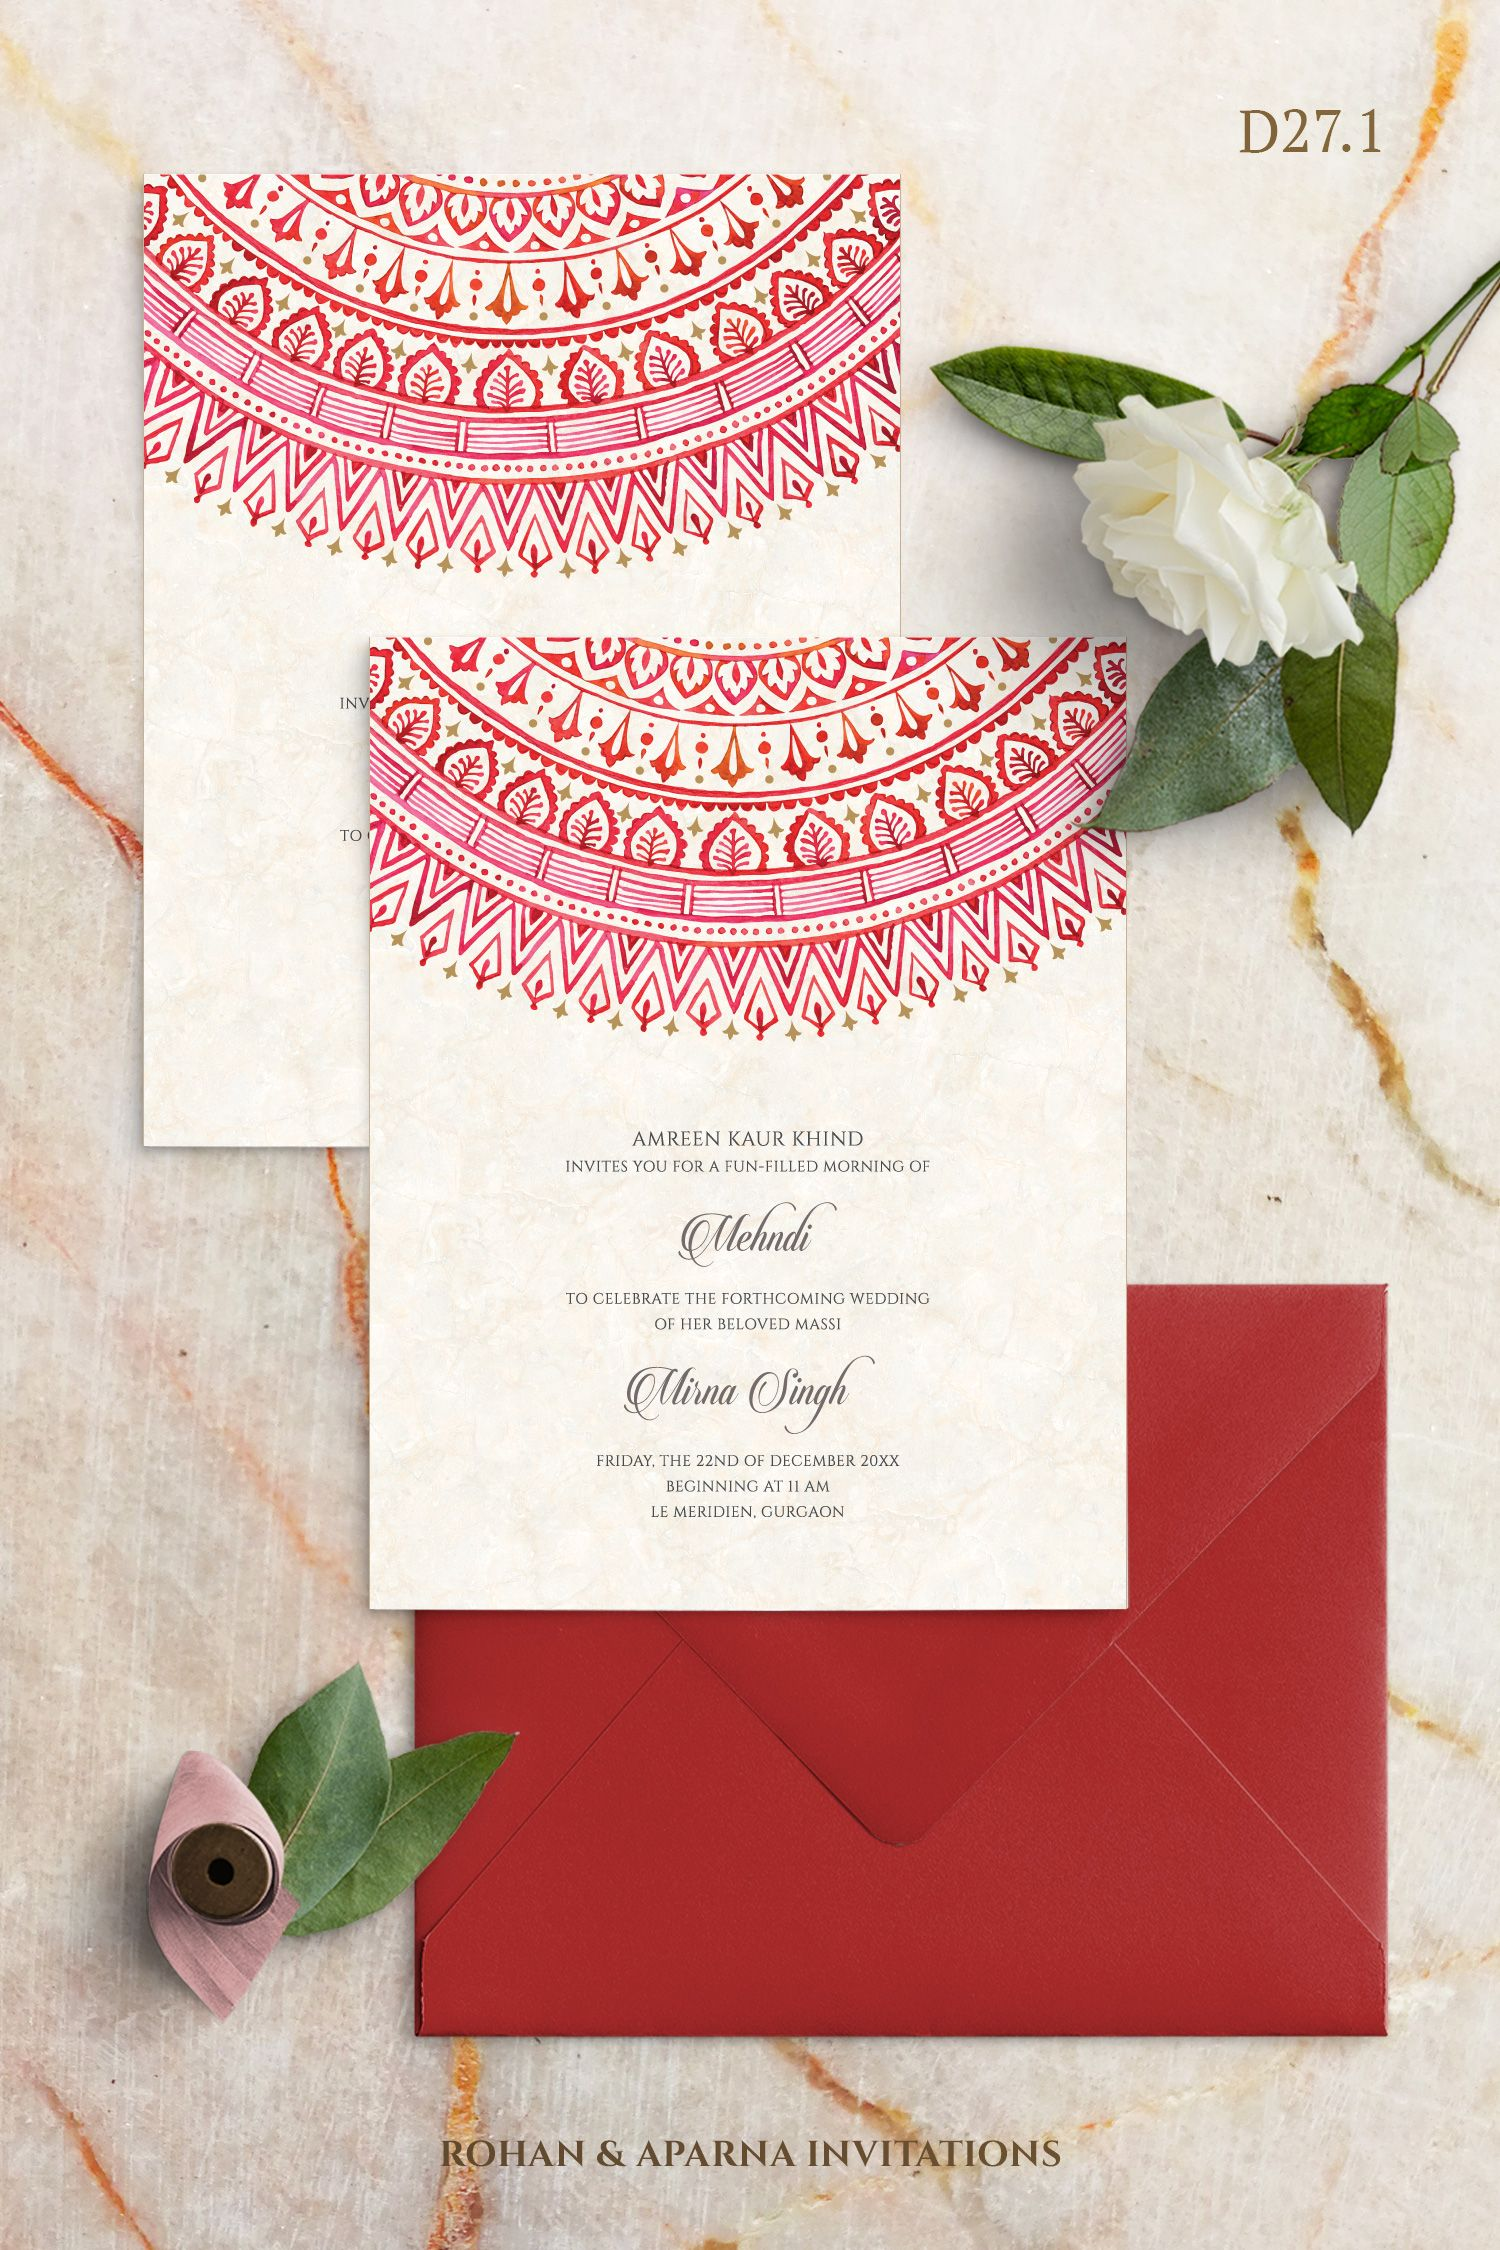 Handmade Mandala Design Wedding Invitation Concept For More Design Hindu Wedding Invitation Cards Wedding Invitation Card Design Creative Wedding Invitations